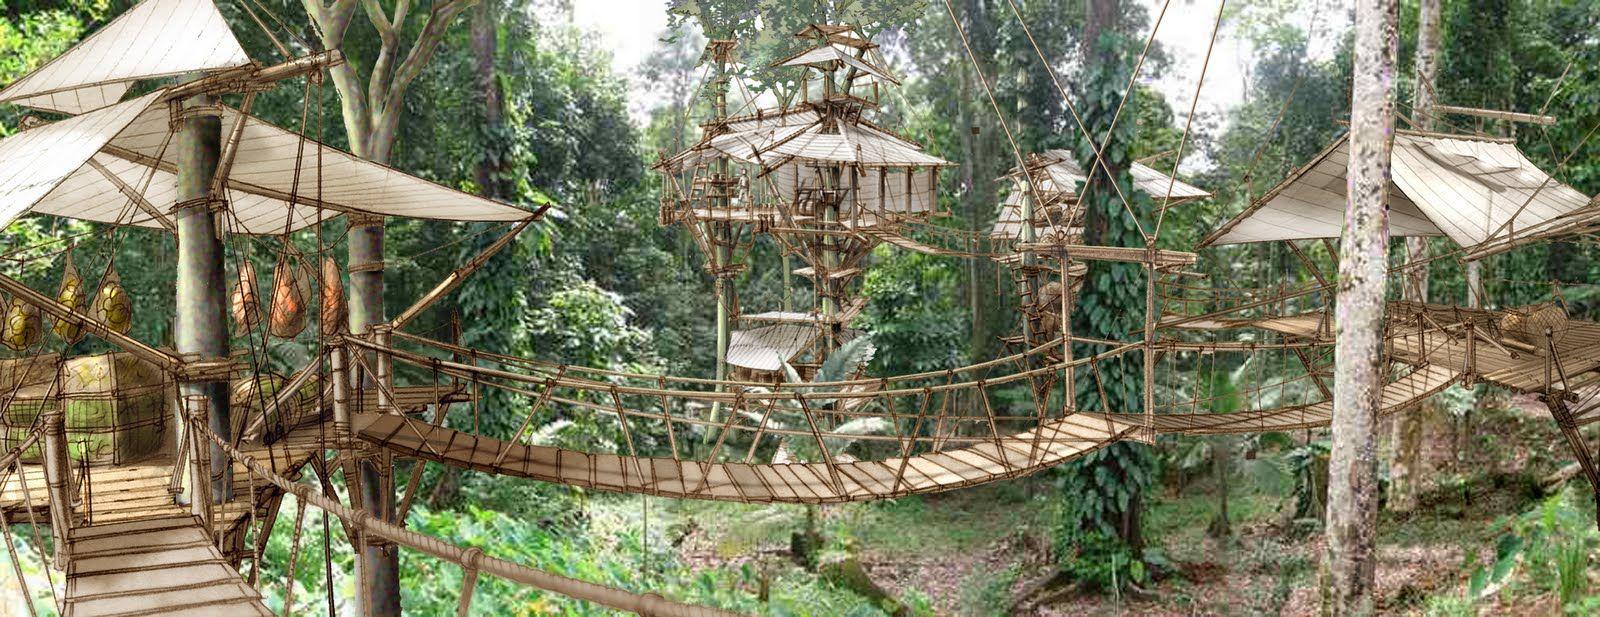 Design Of Tree Huts Aka Robinson Crusoe Tv Show My